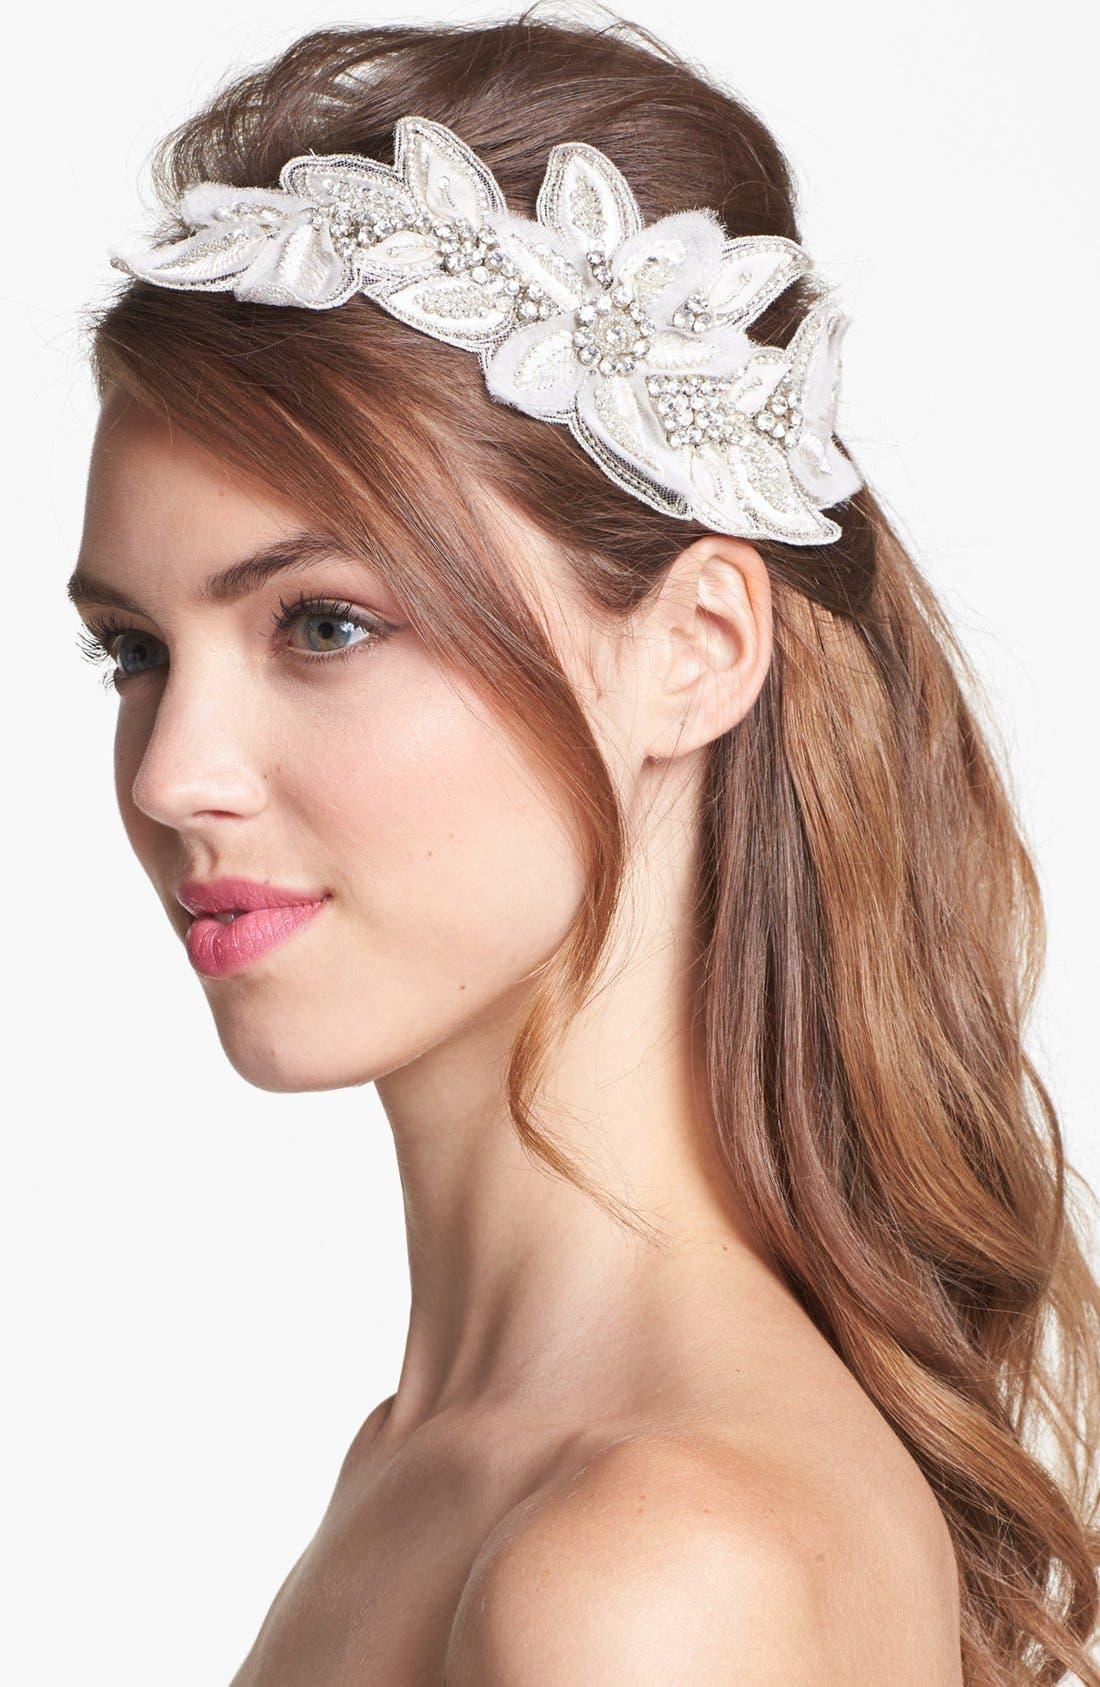 Alternate Image 1 Selected - Untamed Petals by Amanda Judge 'Bianca' Floral Beaded Head Wrap